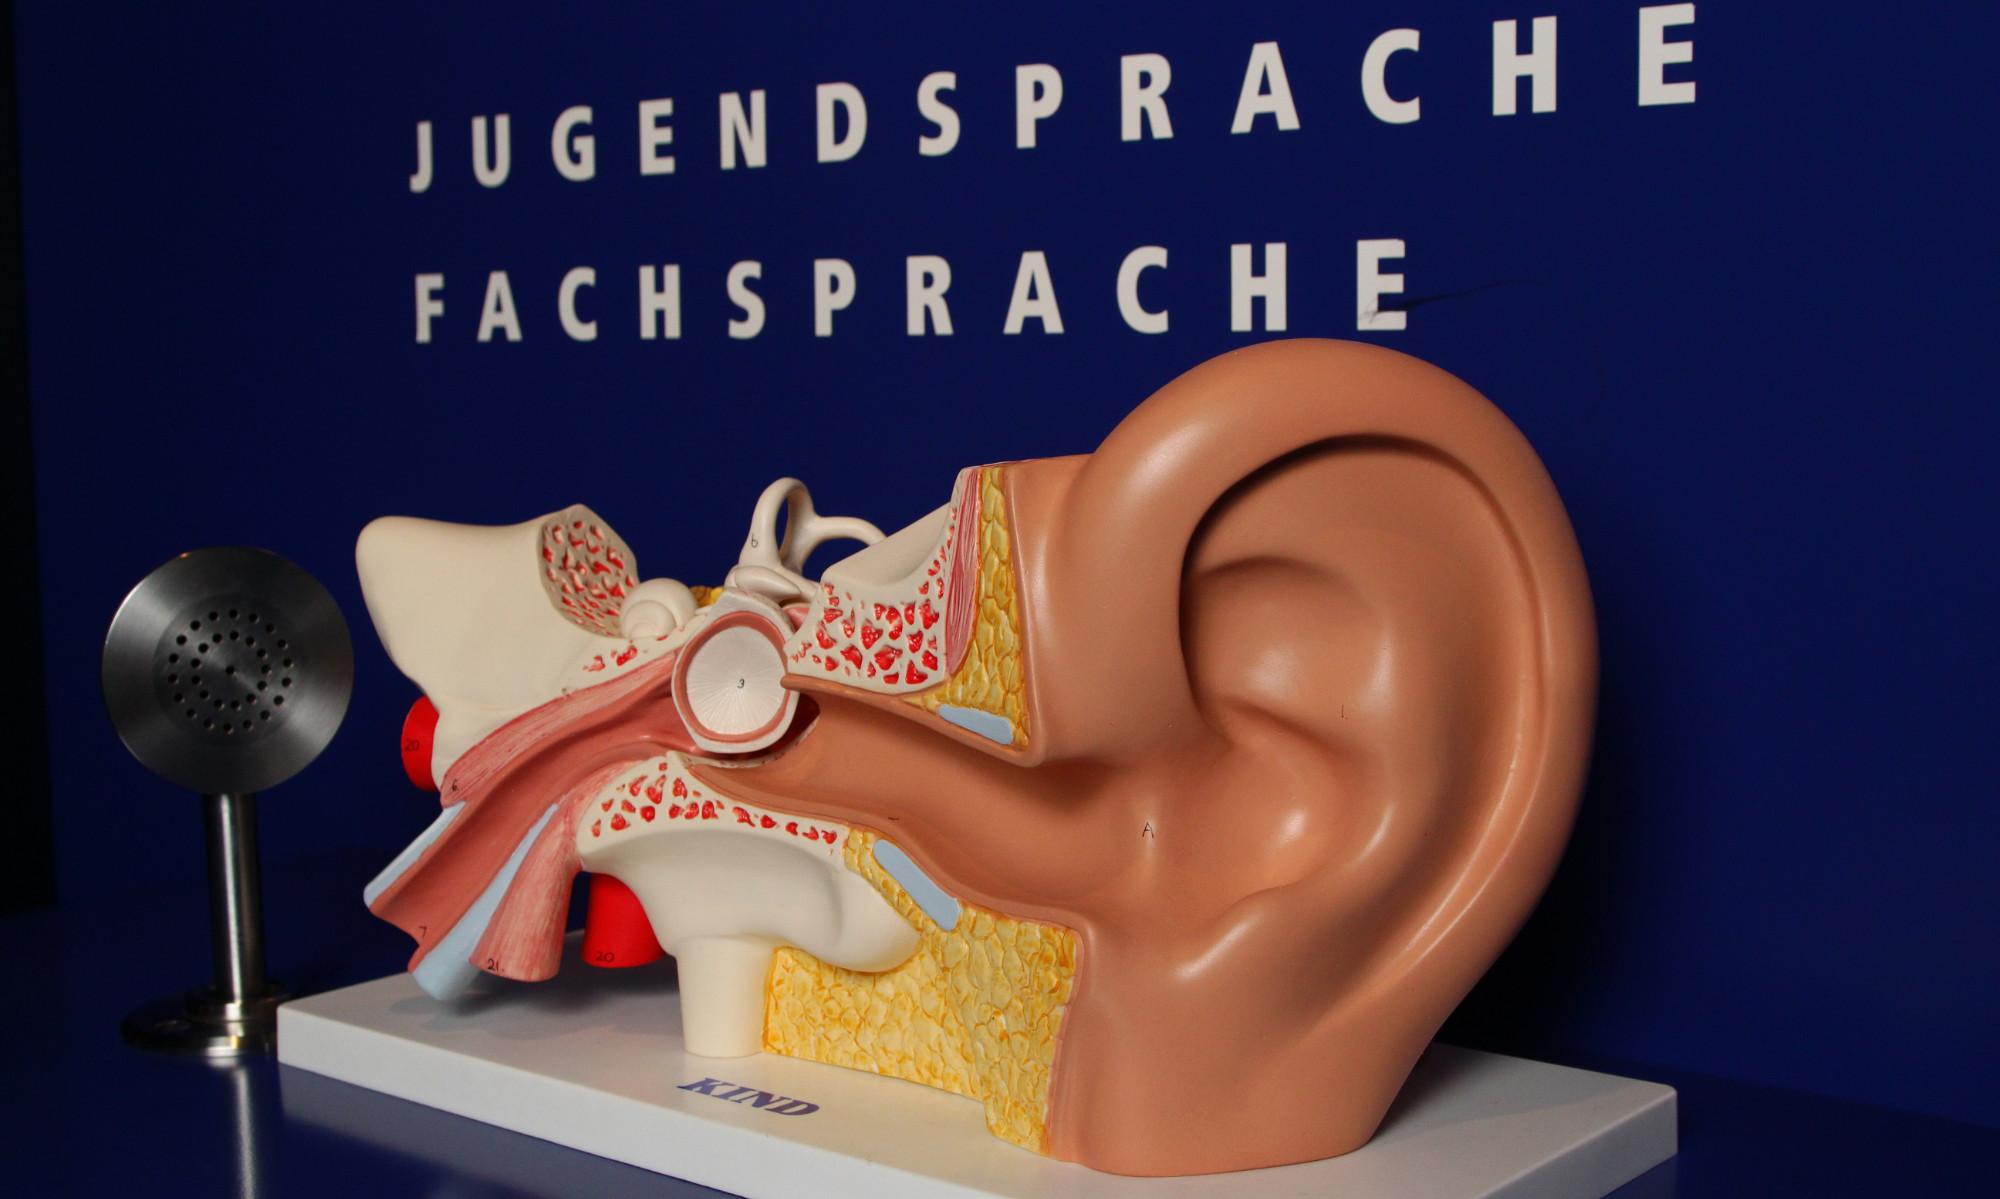 Hör mal - Grundschule, Museum für Kommunikation Nürnberg